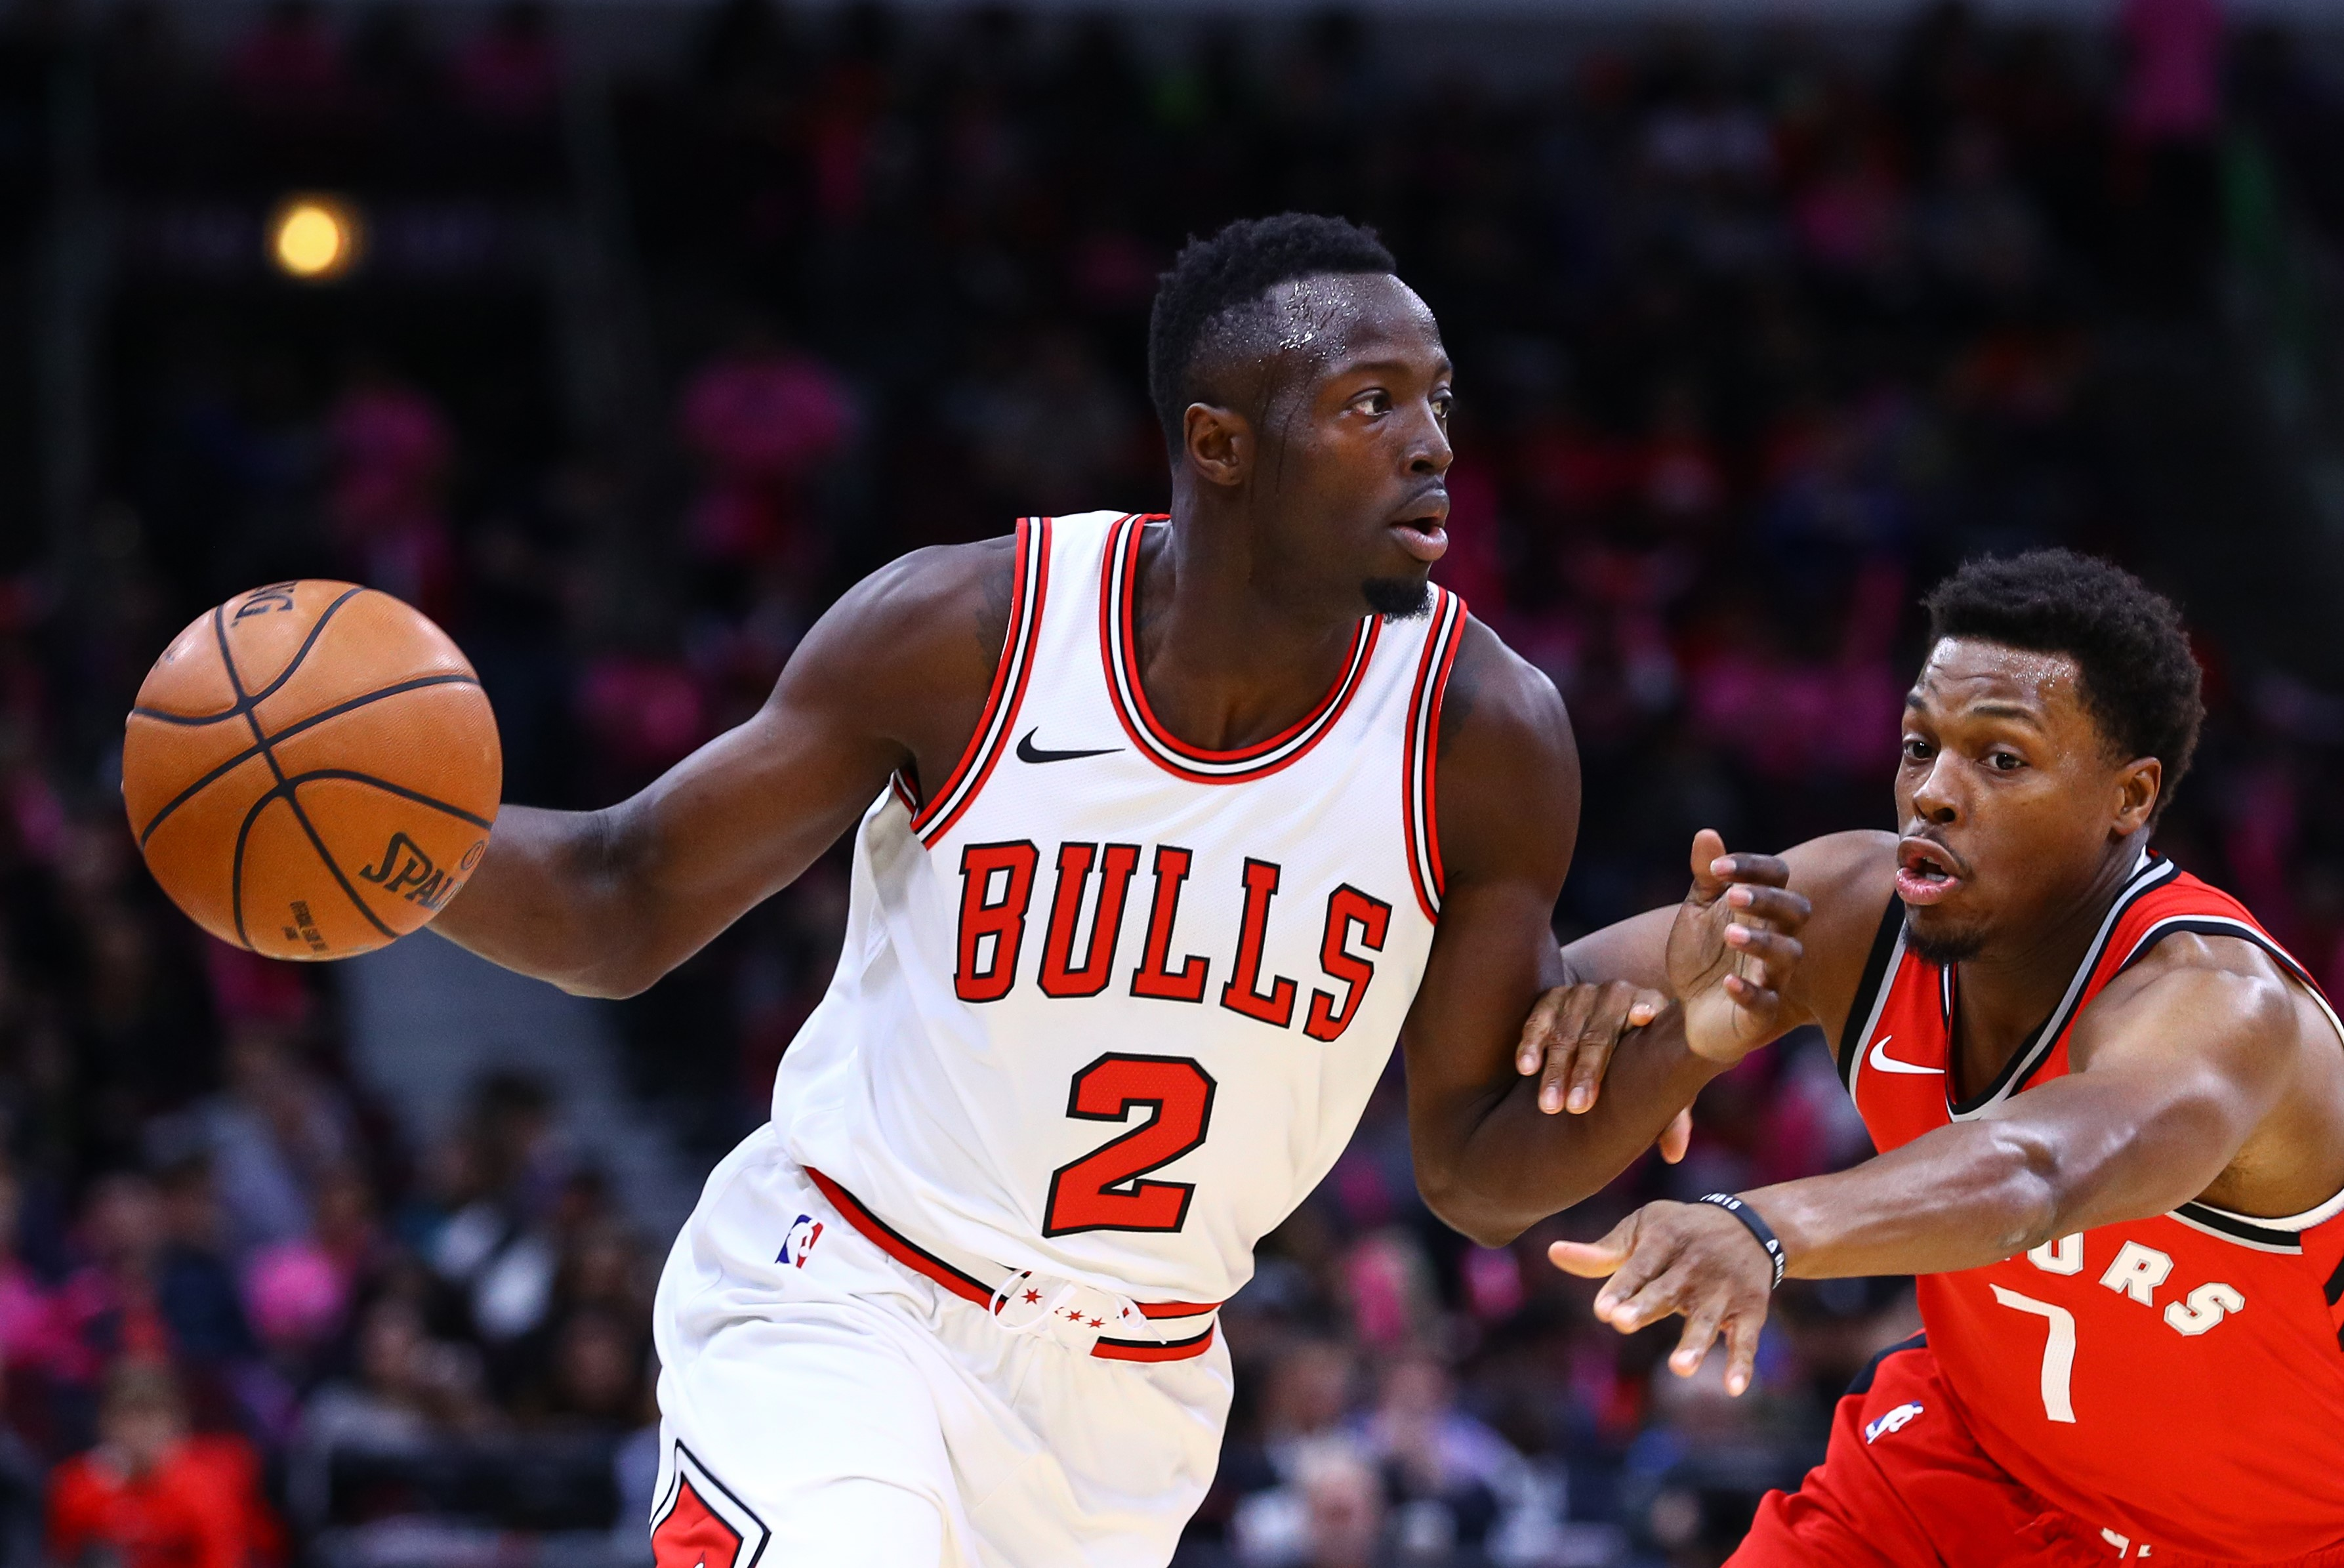 Raptors: Is The Toronto Raptors And Chicago Bulls Rivalry Over?